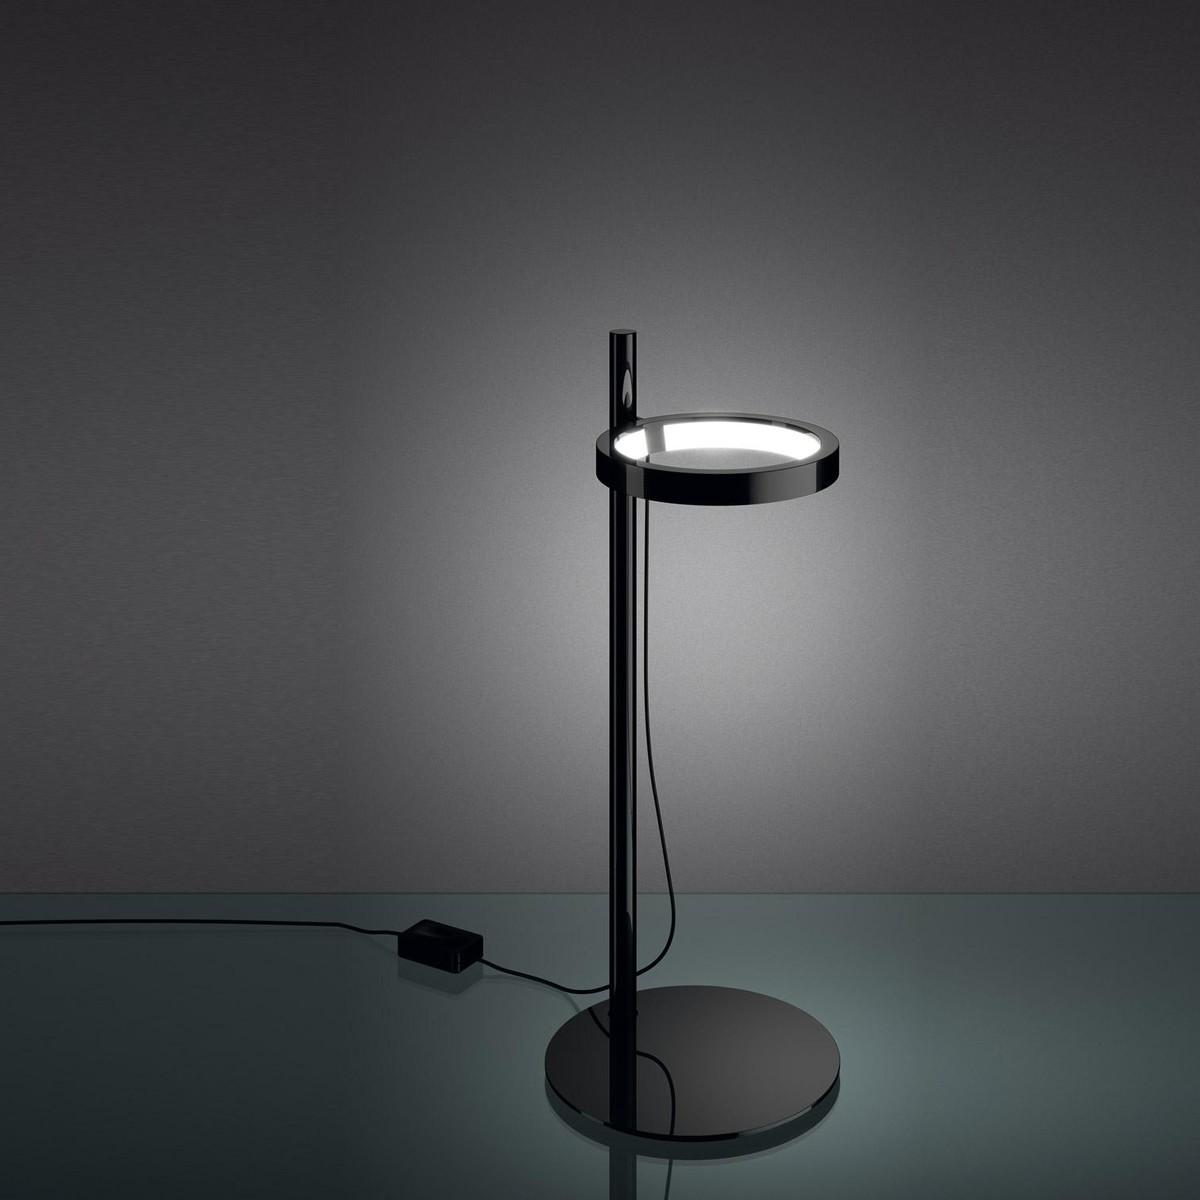 ipparco led lampe de bureau artemide. Black Bedroom Furniture Sets. Home Design Ideas